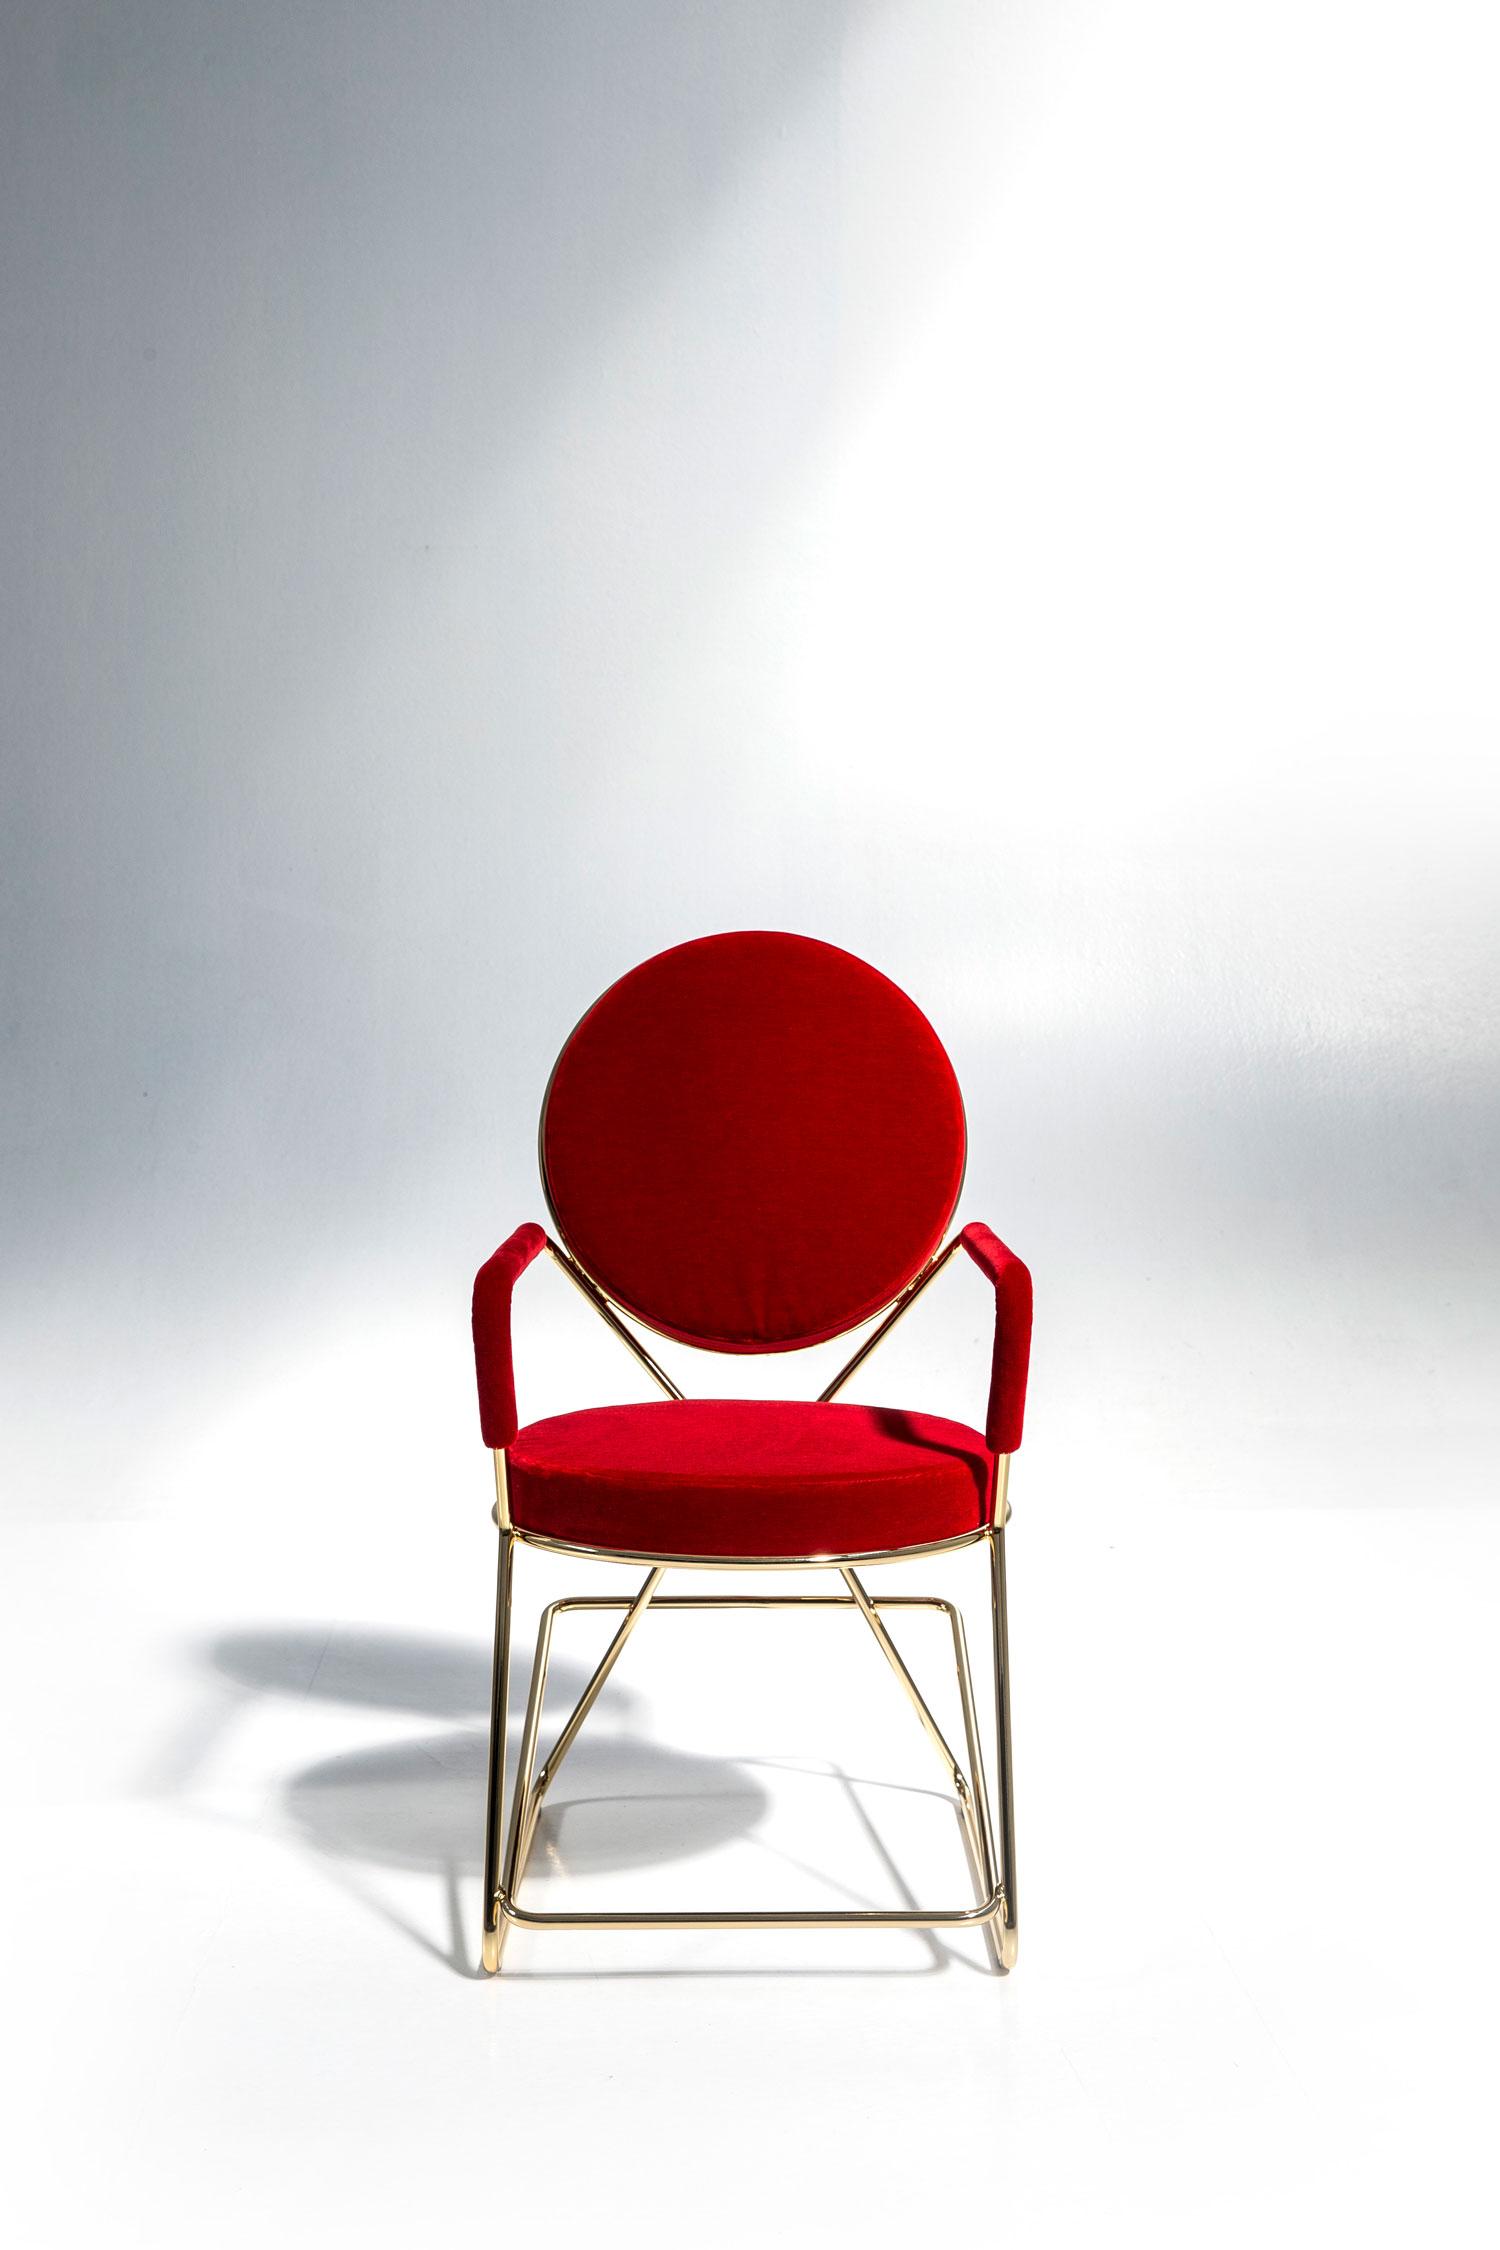 Moroso Double Zero Chair by DAVID ADJAYE - Best of Salone Del Mobile 2015   Yellowtrace